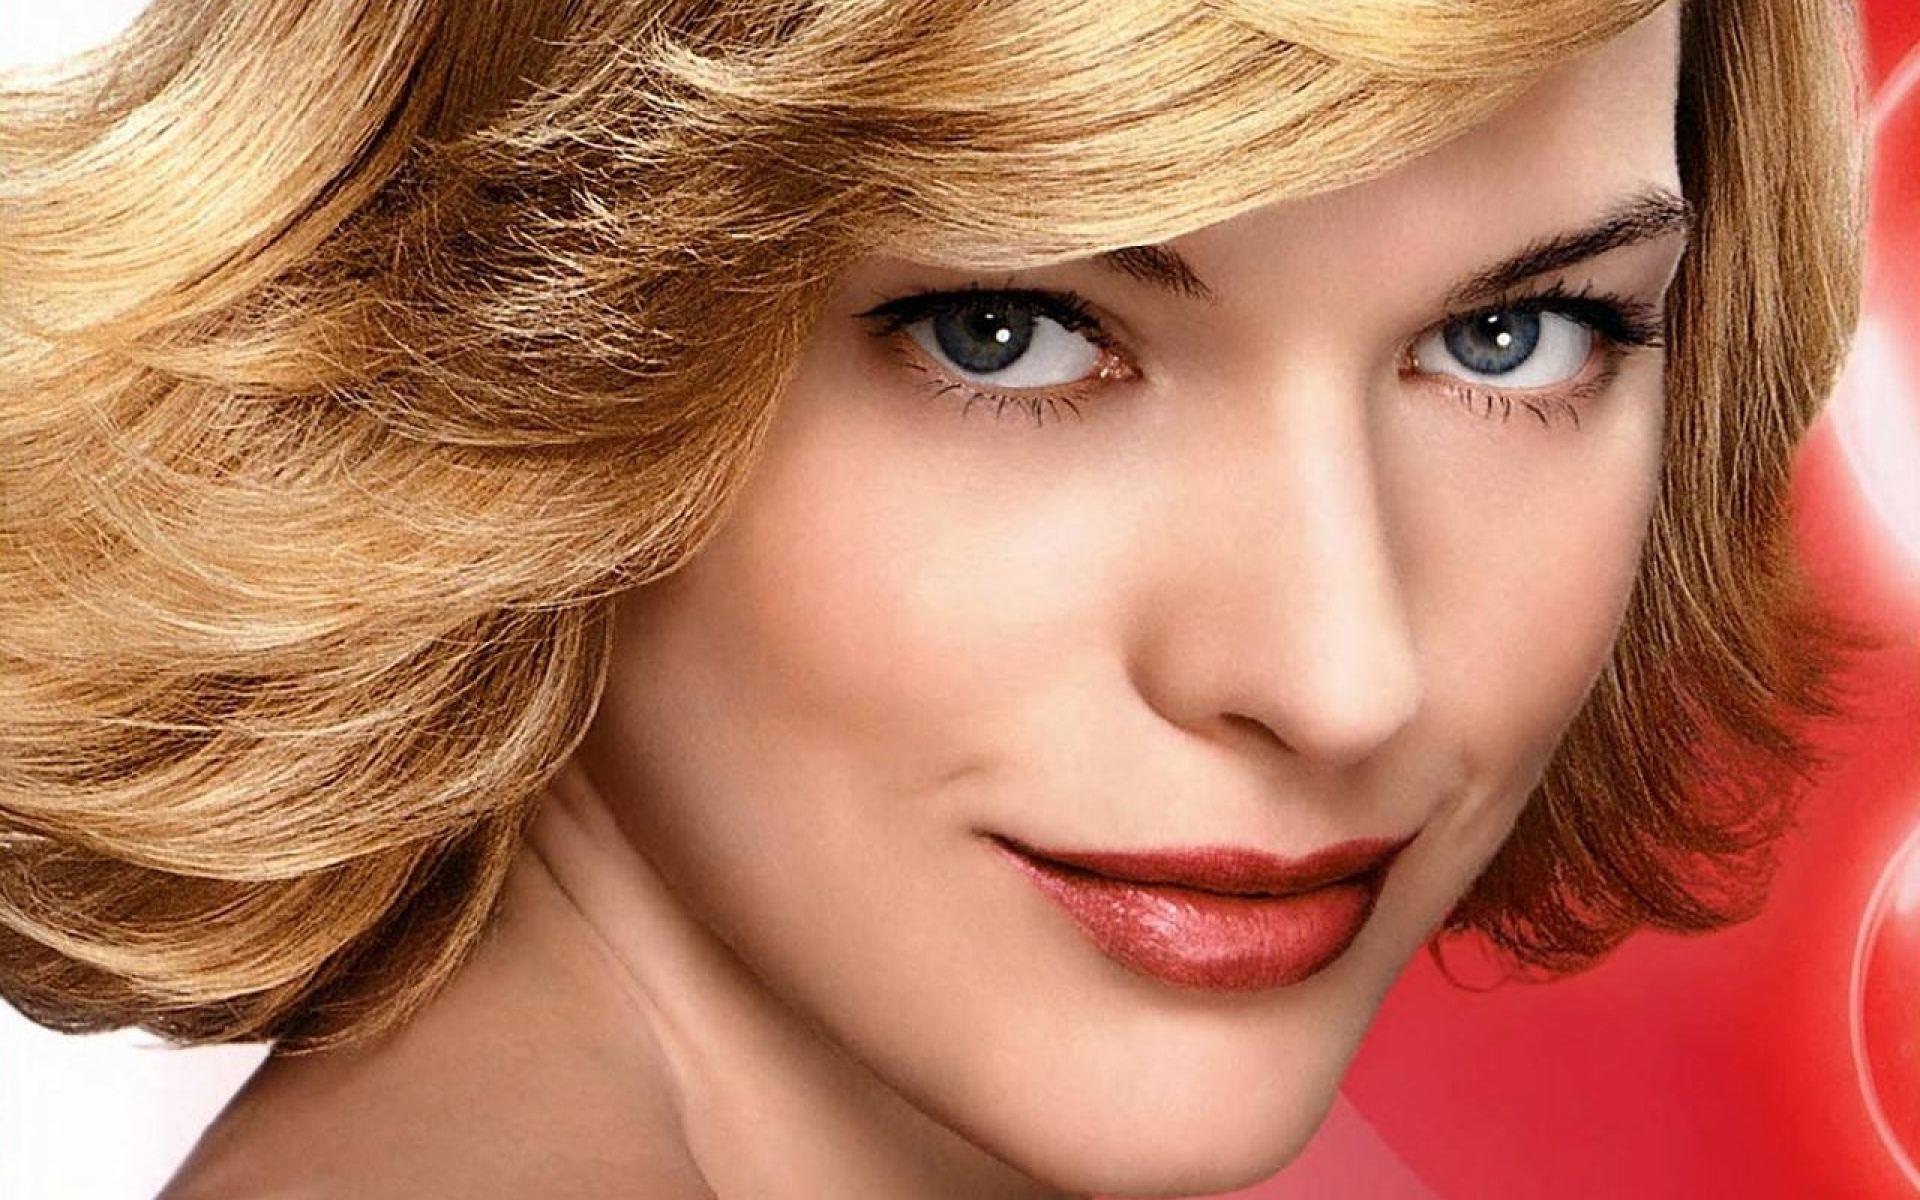 Milla Jovovich Face Wallpaper HD Downlod For Desktop